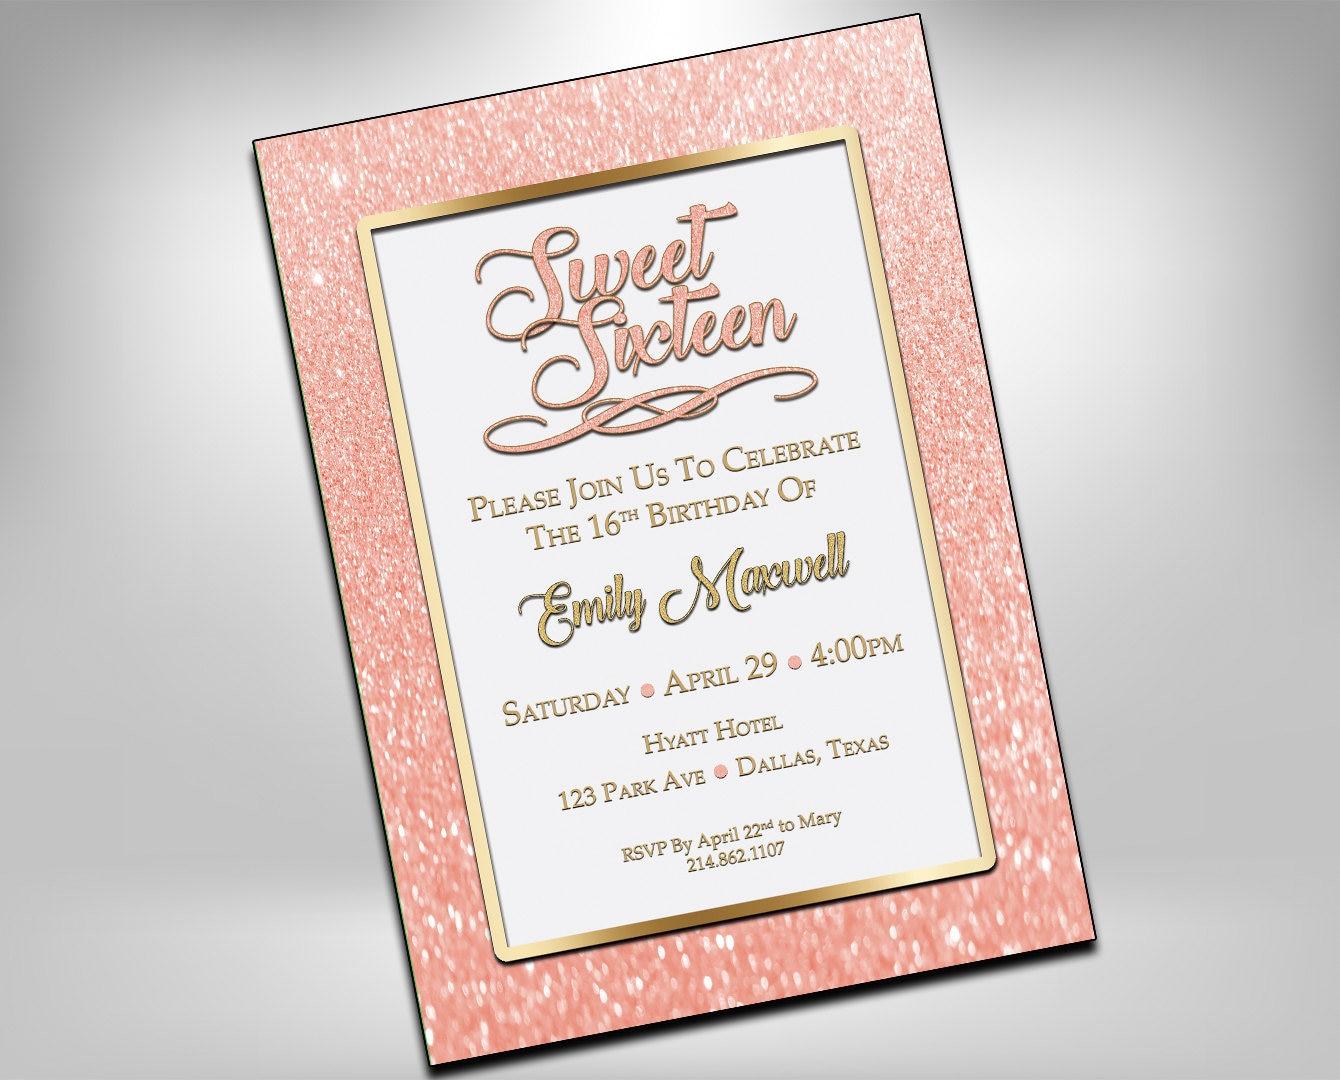 Sweet 16 Birthday Invitations Sweet Sixteen Invites 16th | Etsy